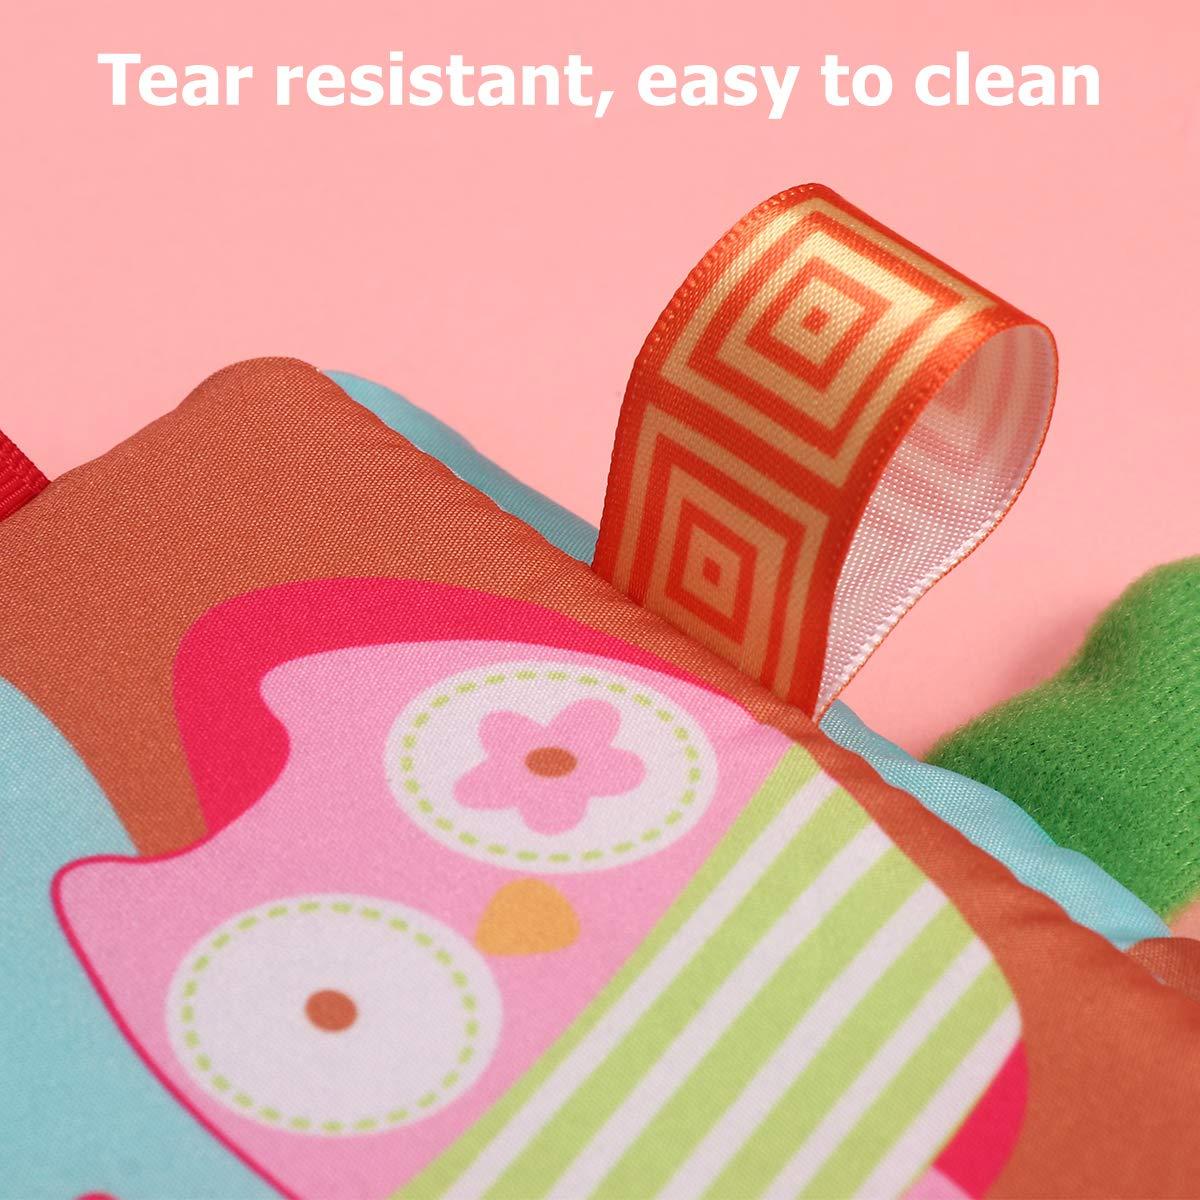 TOYANDONA Soft Book for Baby First Cloth Book Libros educativos tempranos Juguetes para beb/és Ni/ños peque/ños